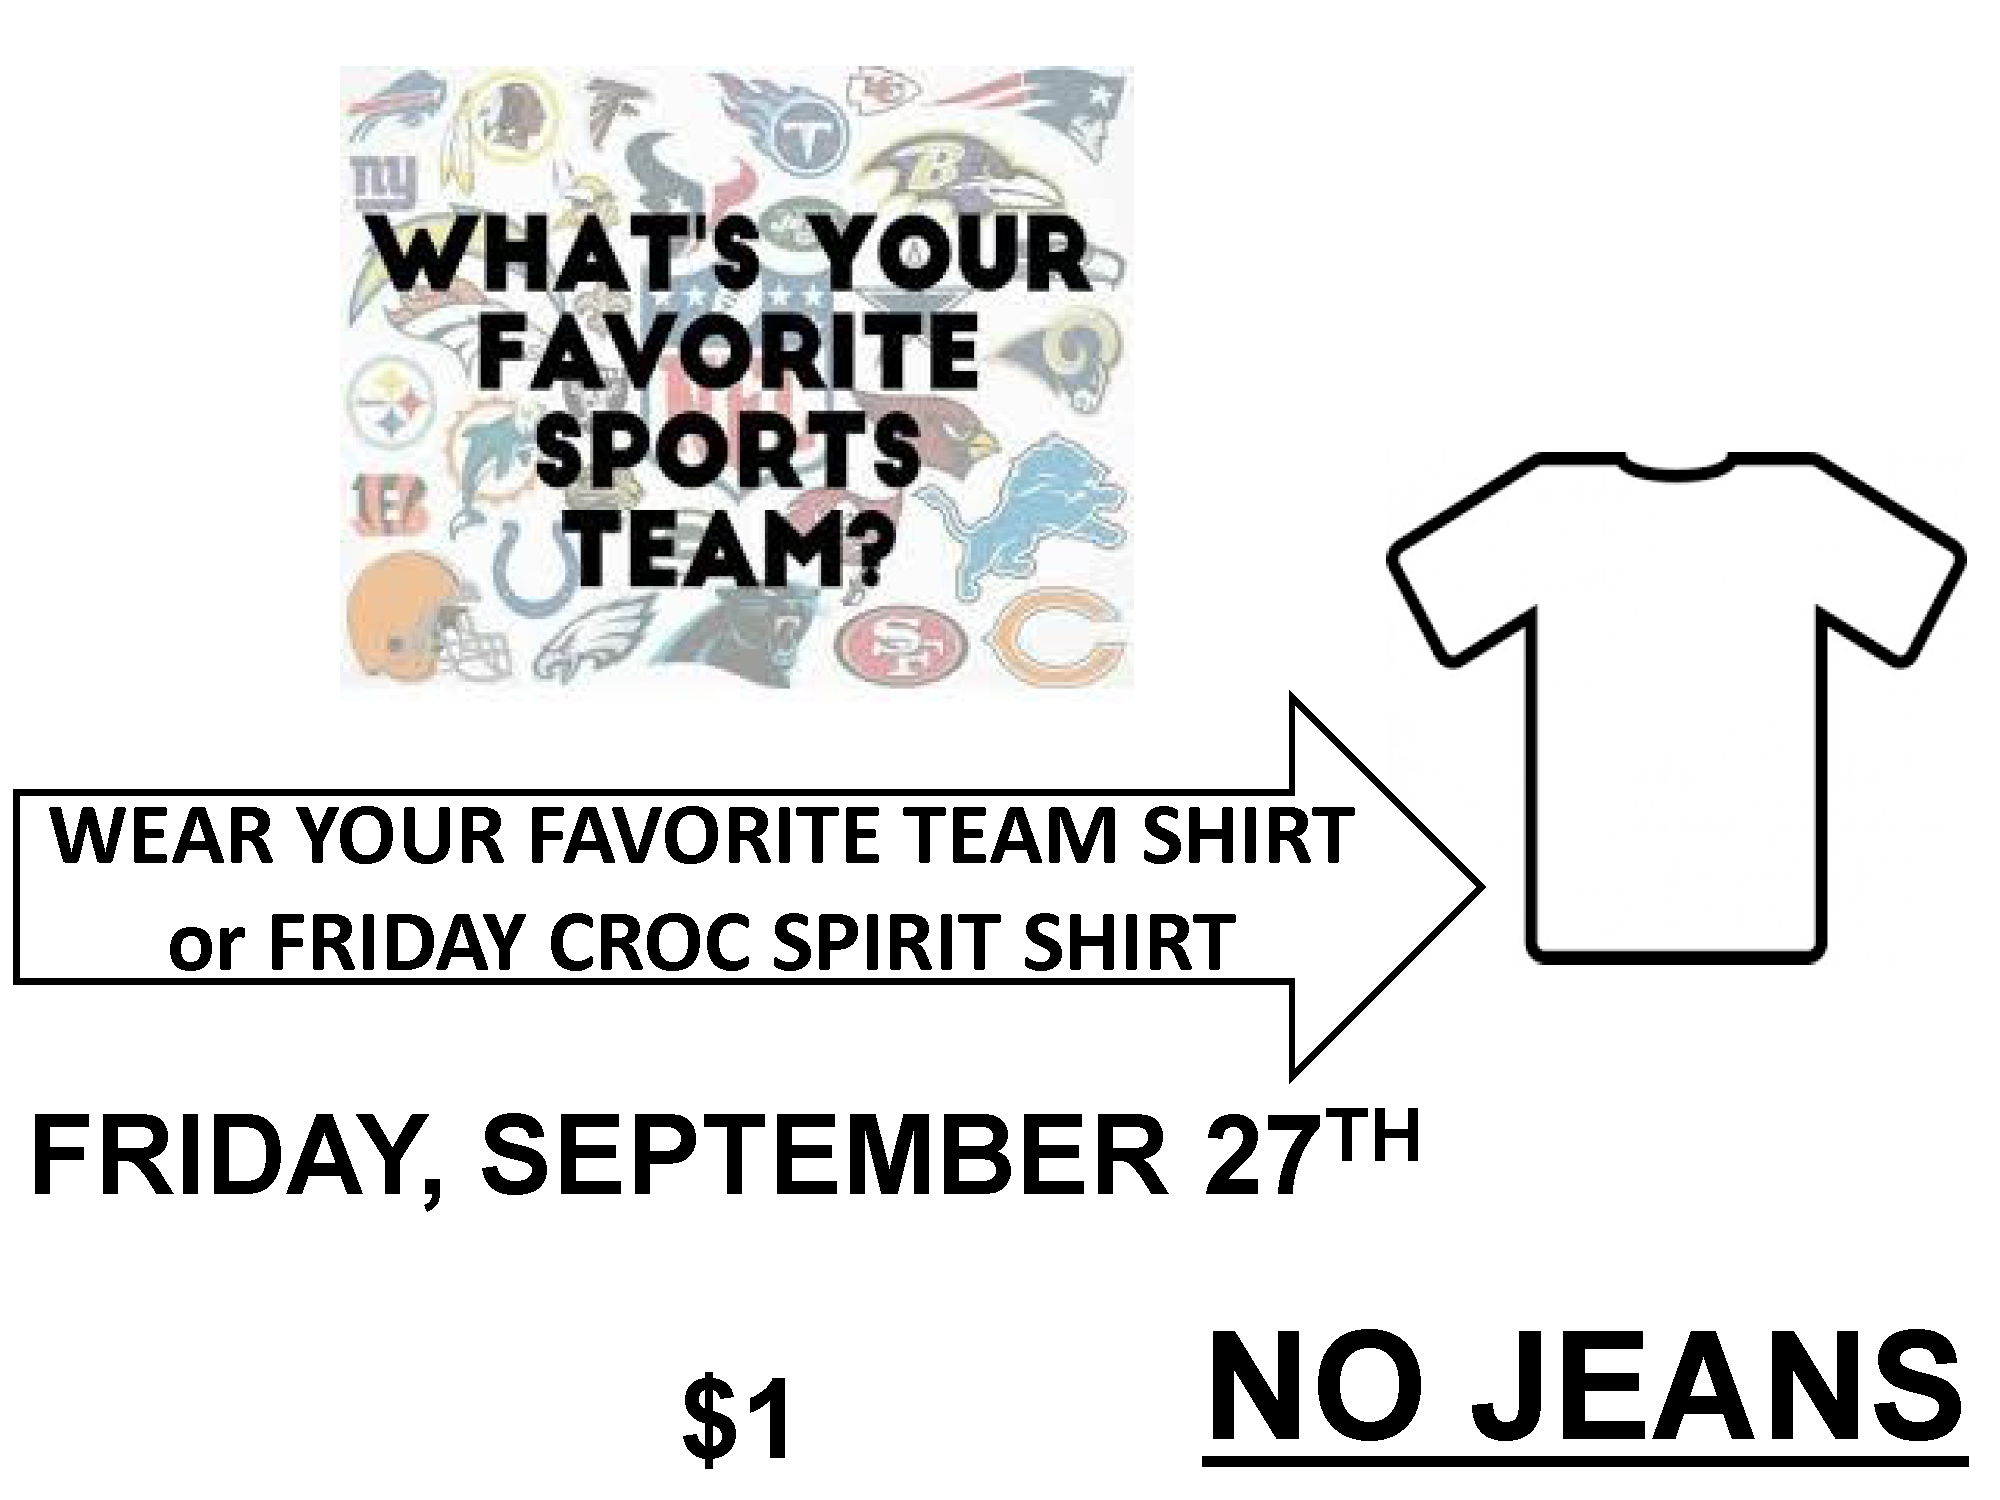 Favorite Sports Team Shirt Day $1